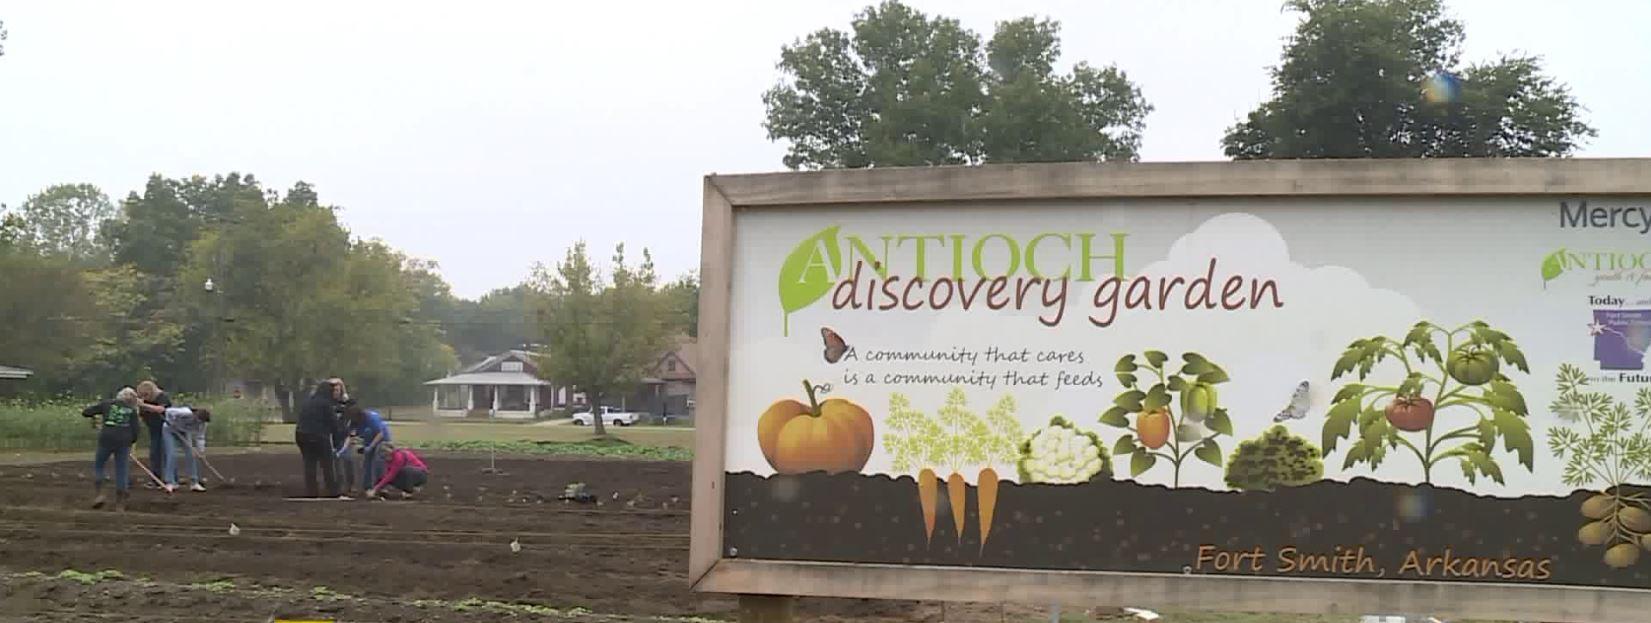 Antioch Discovery Garden Ft. Smith